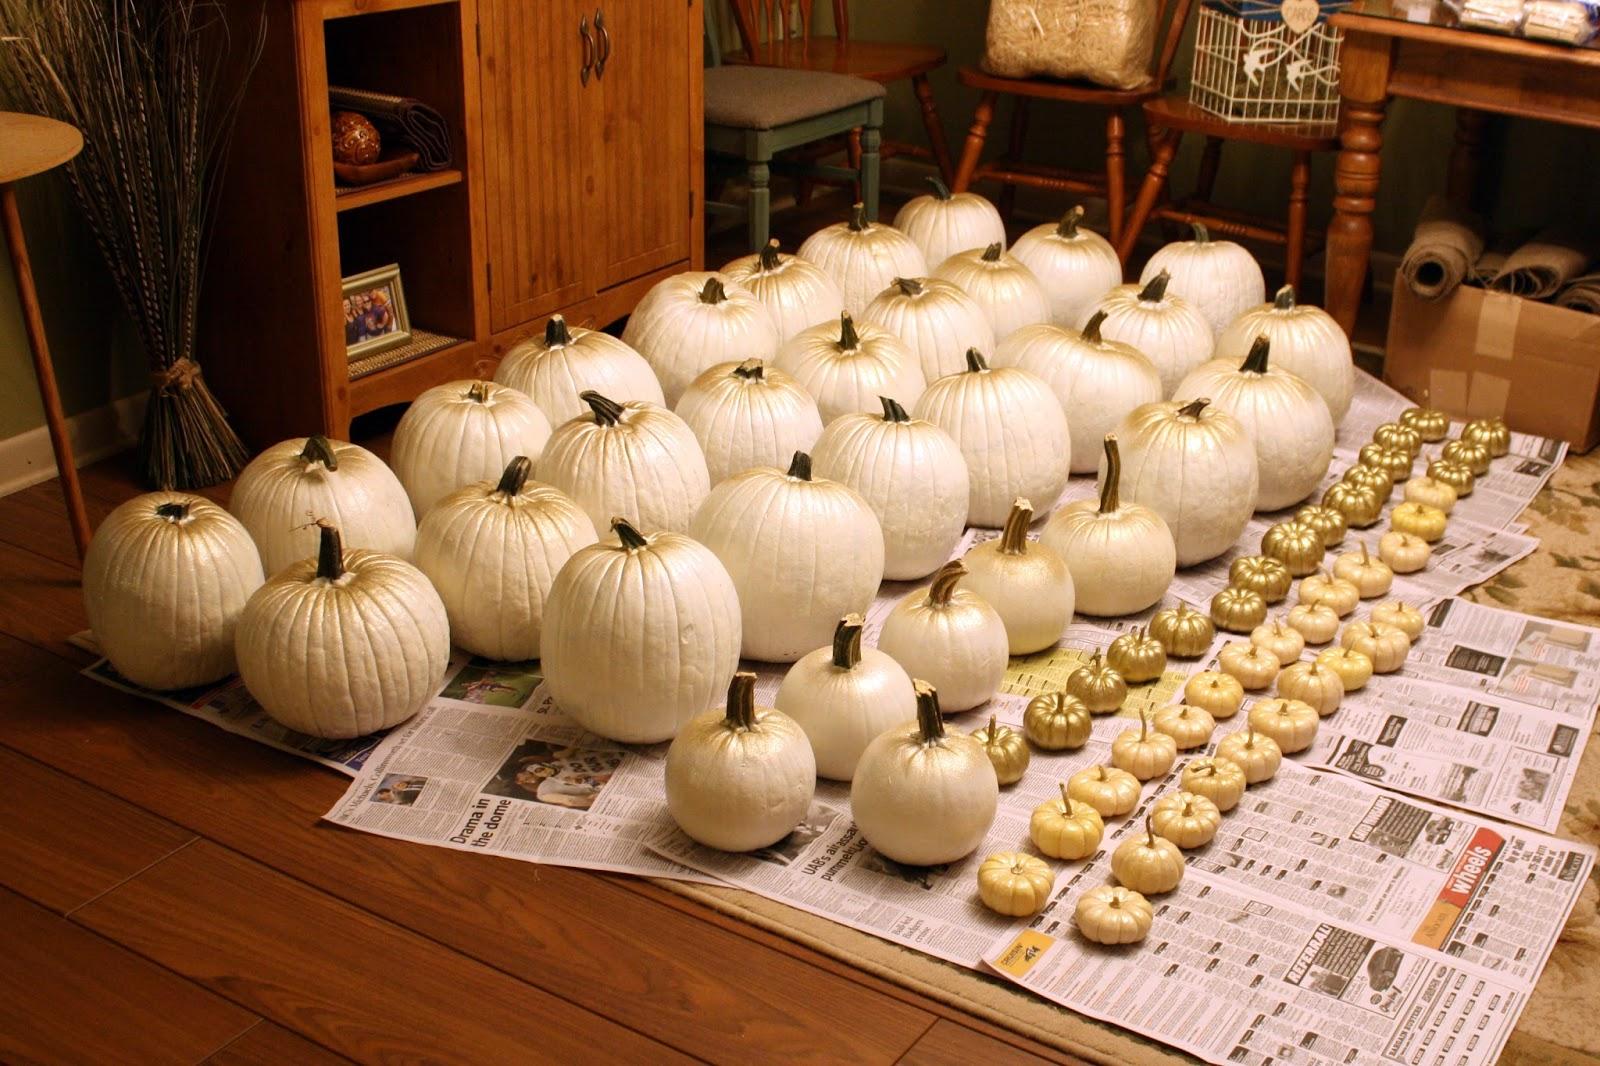 Fall wedding series 3 pumpkins burlap and mason jars for White pumpkin table decorations